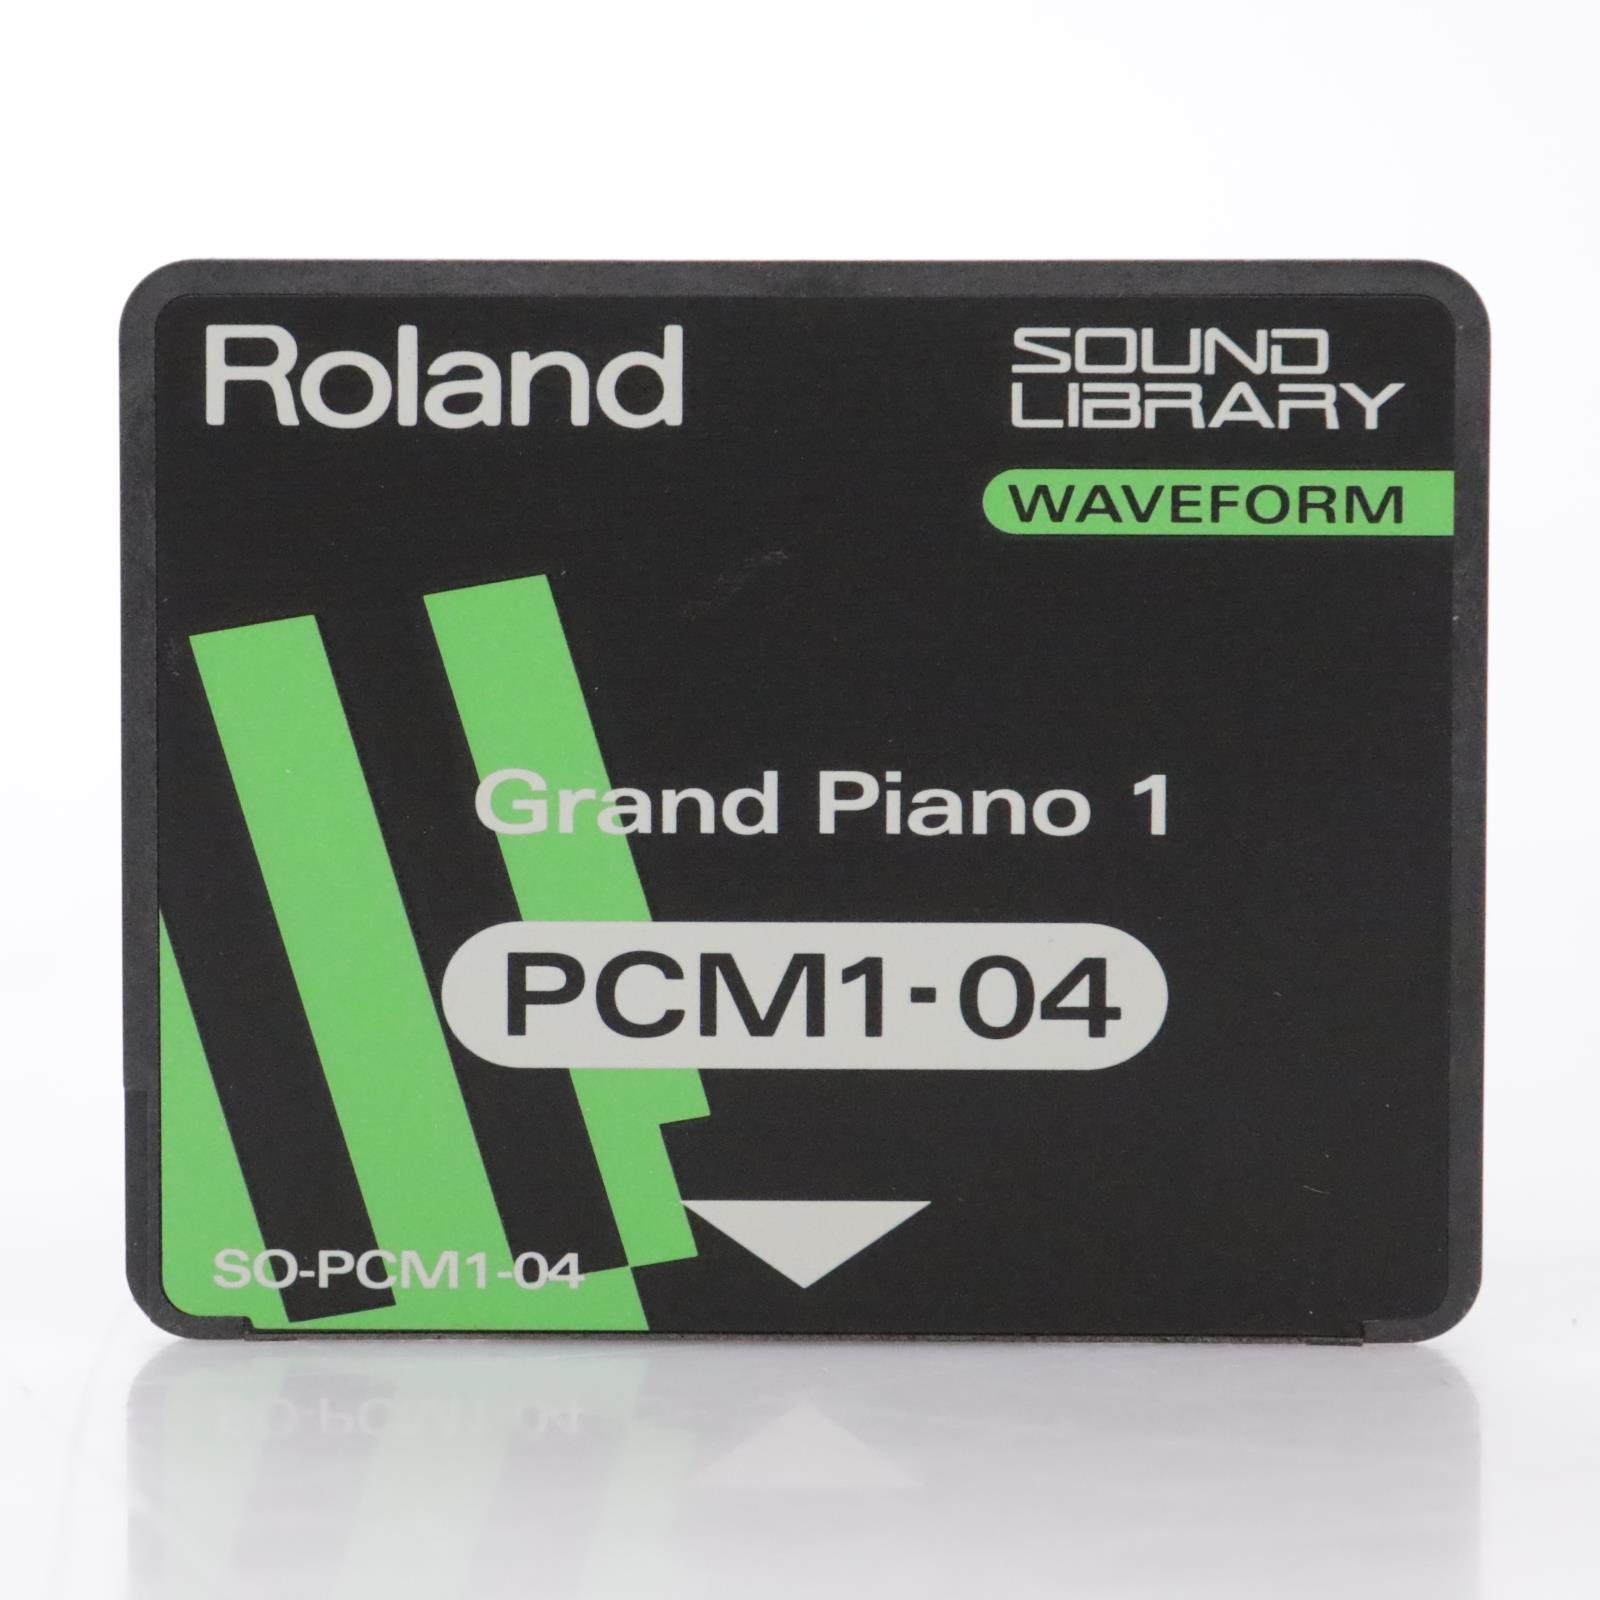 Roland SO-PCM1-04 Grand Piano 1 Sound Library Waveform Card for JV-80 #44286